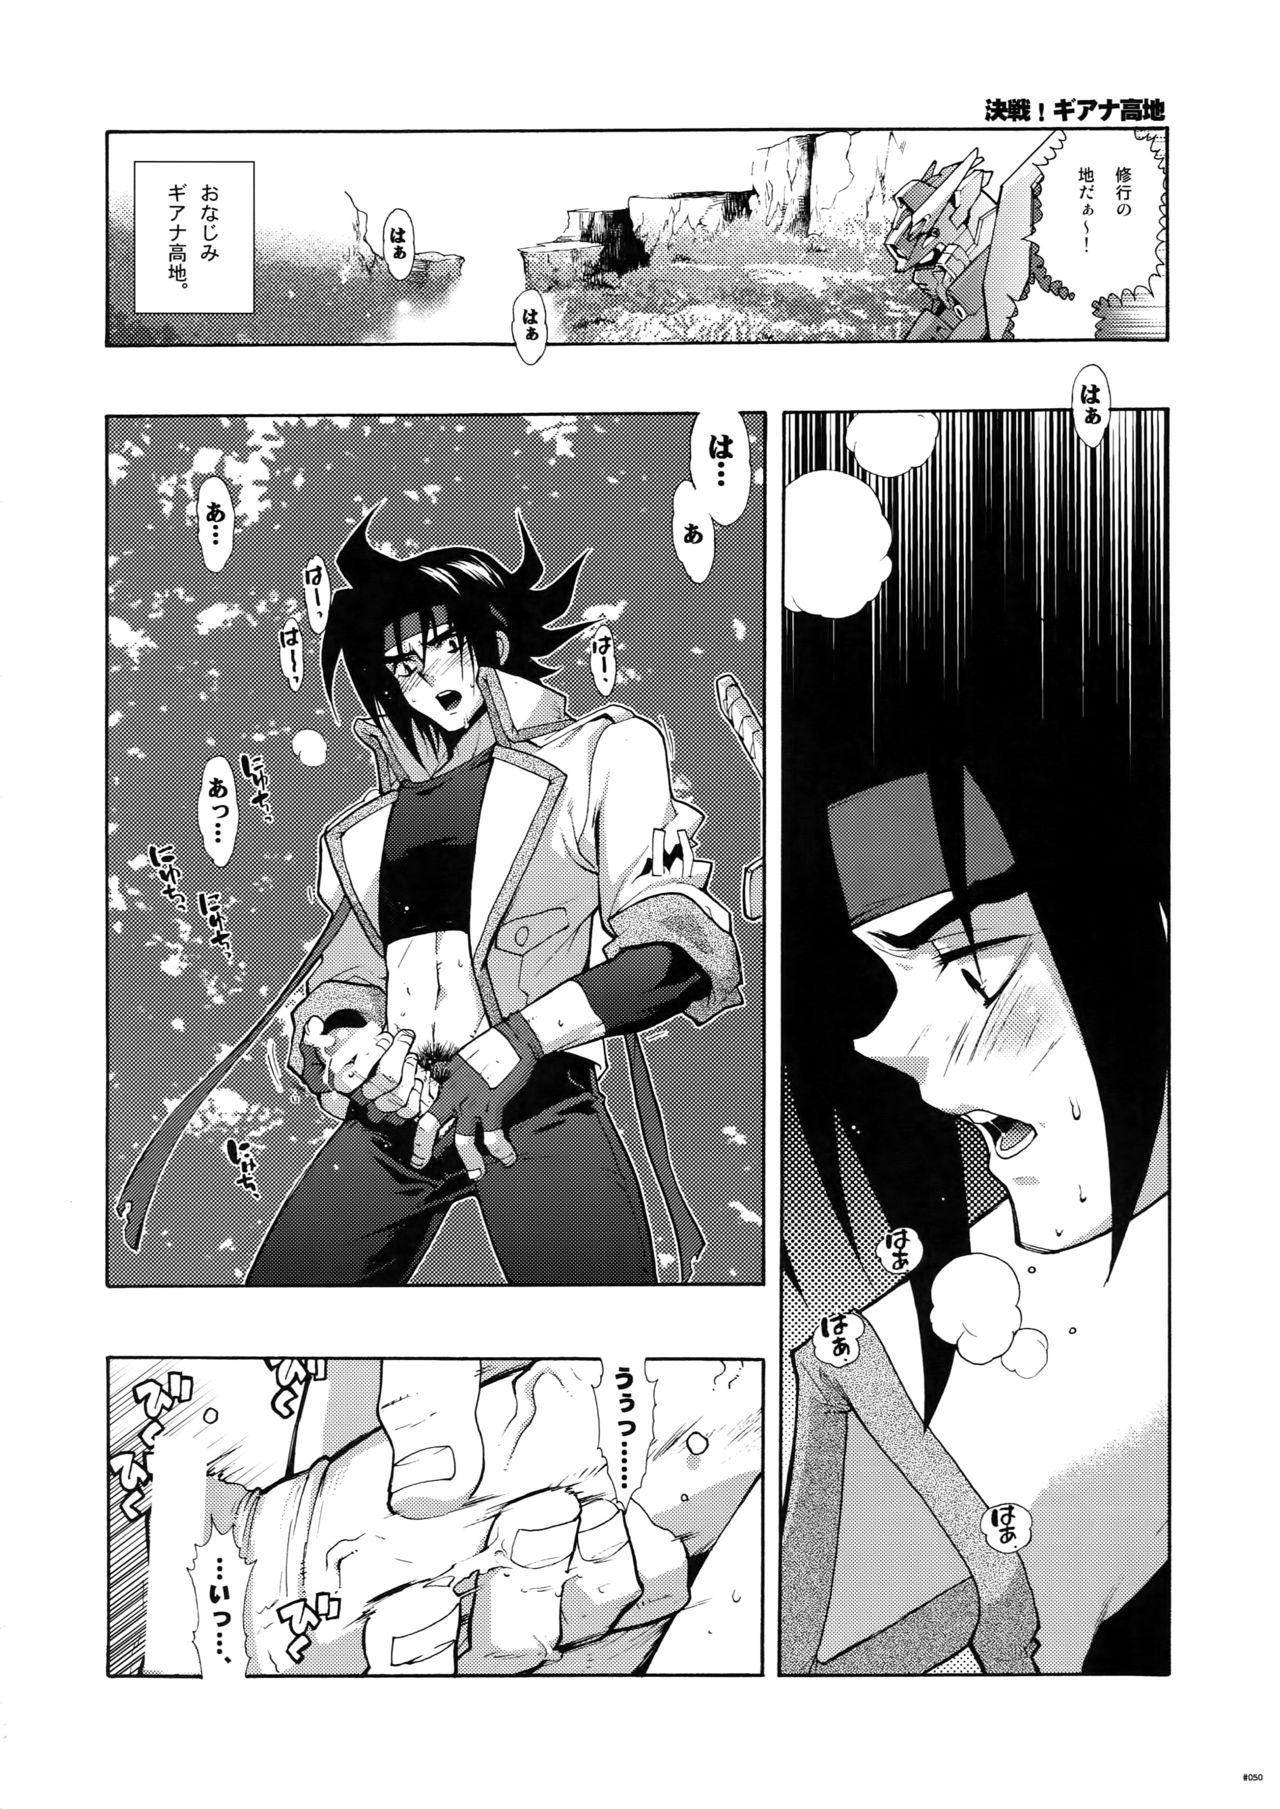 [Article 60 of Criminal Code (Shuhan)] G-gan Josei-Muke Sairoku-Shuu (G Gundam) 49